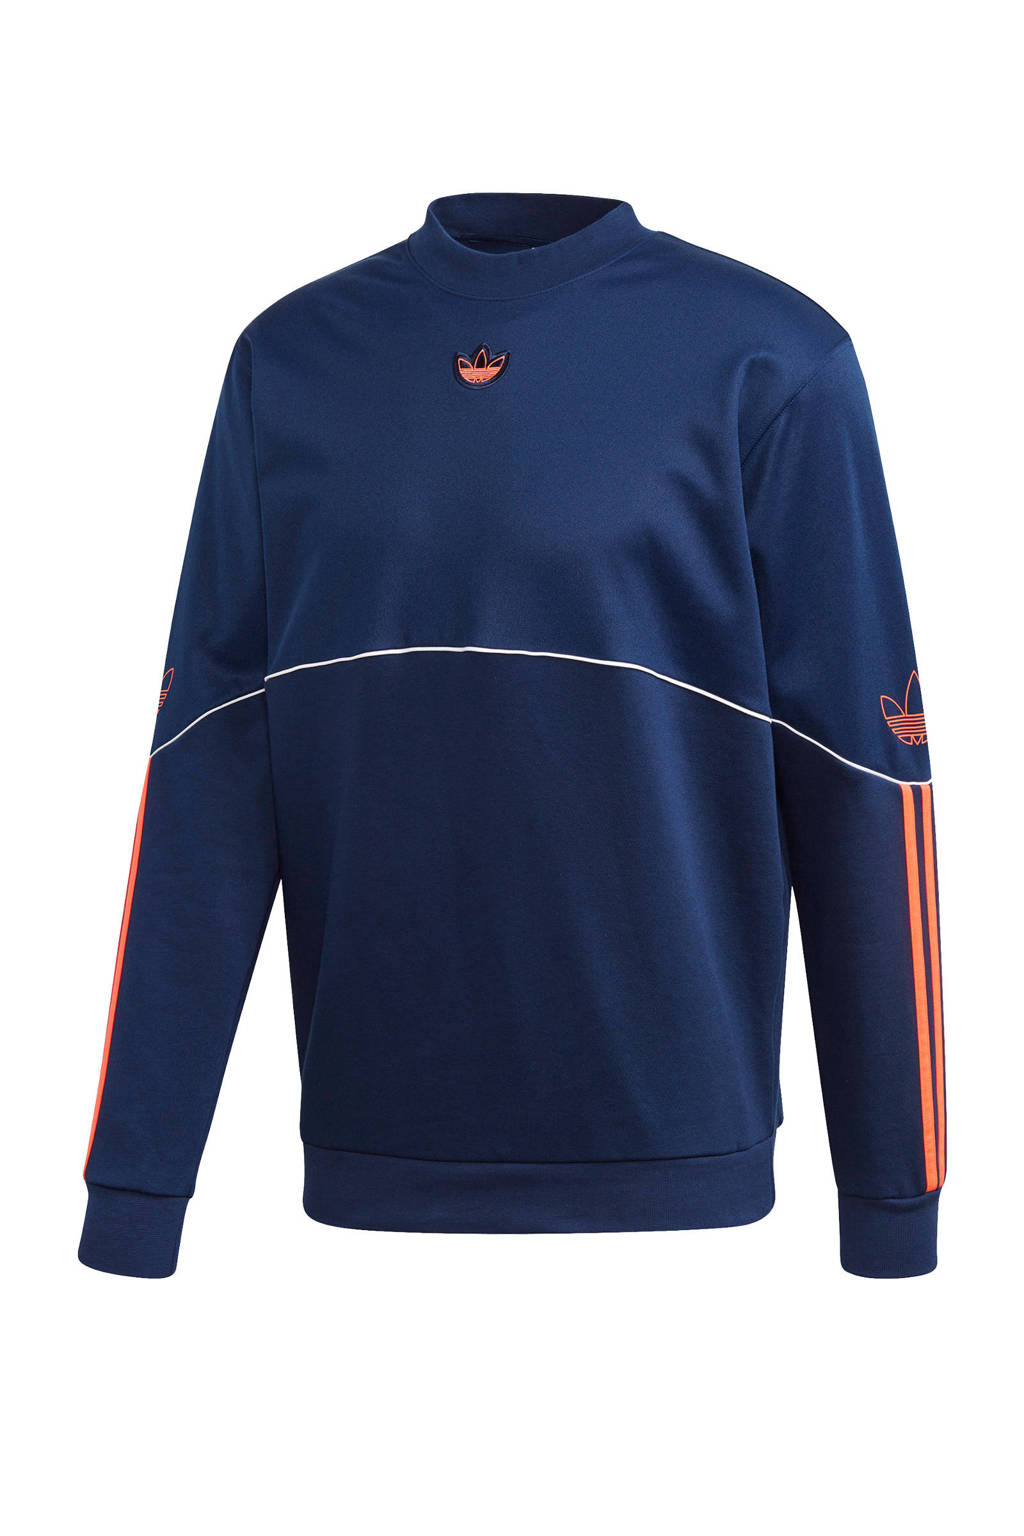 adidas Originals   sweater donkerblauw/oranje, Donkerblauw/oranje